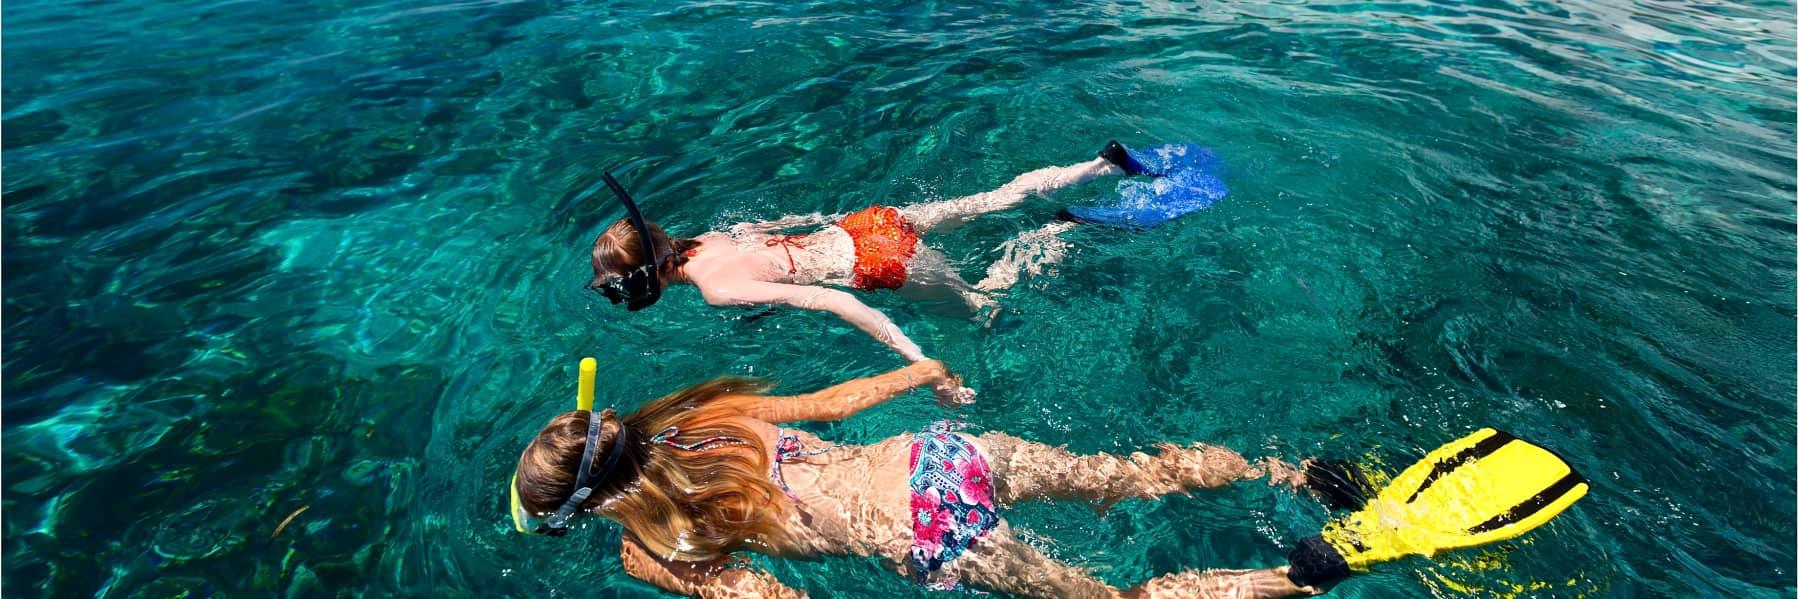 Gili Islands & Gili Nanggu Snorkelling Tour (Lombok) – Full Day gallery